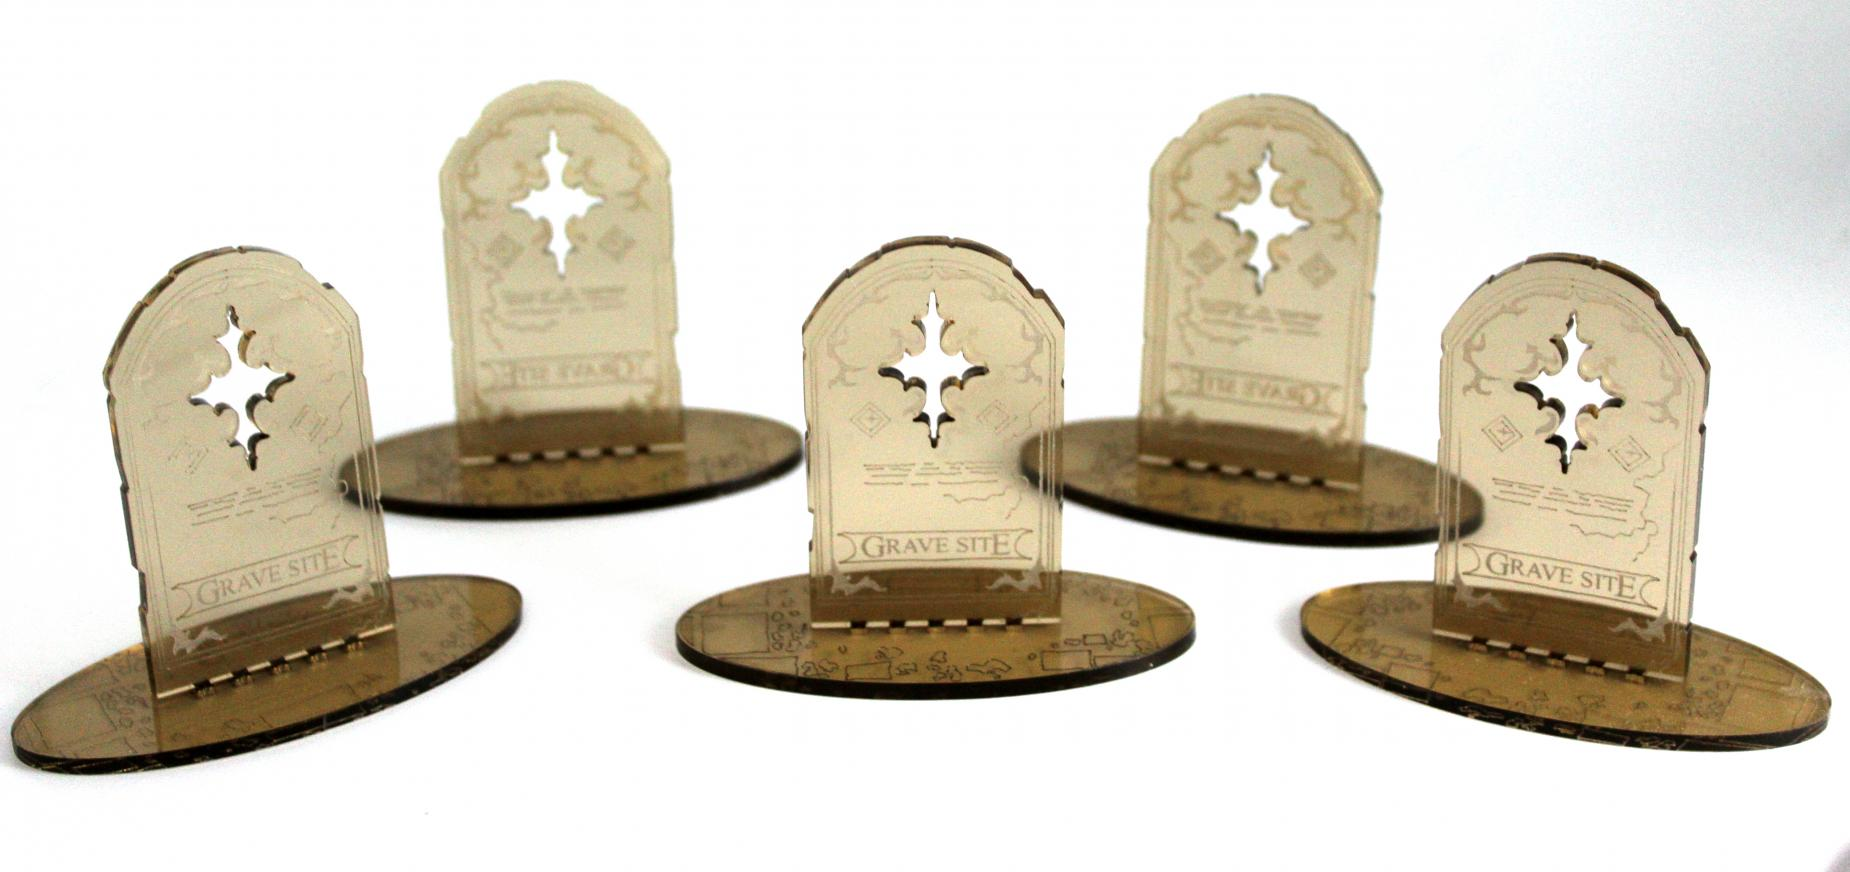 Element Essentials Grave Site Markers